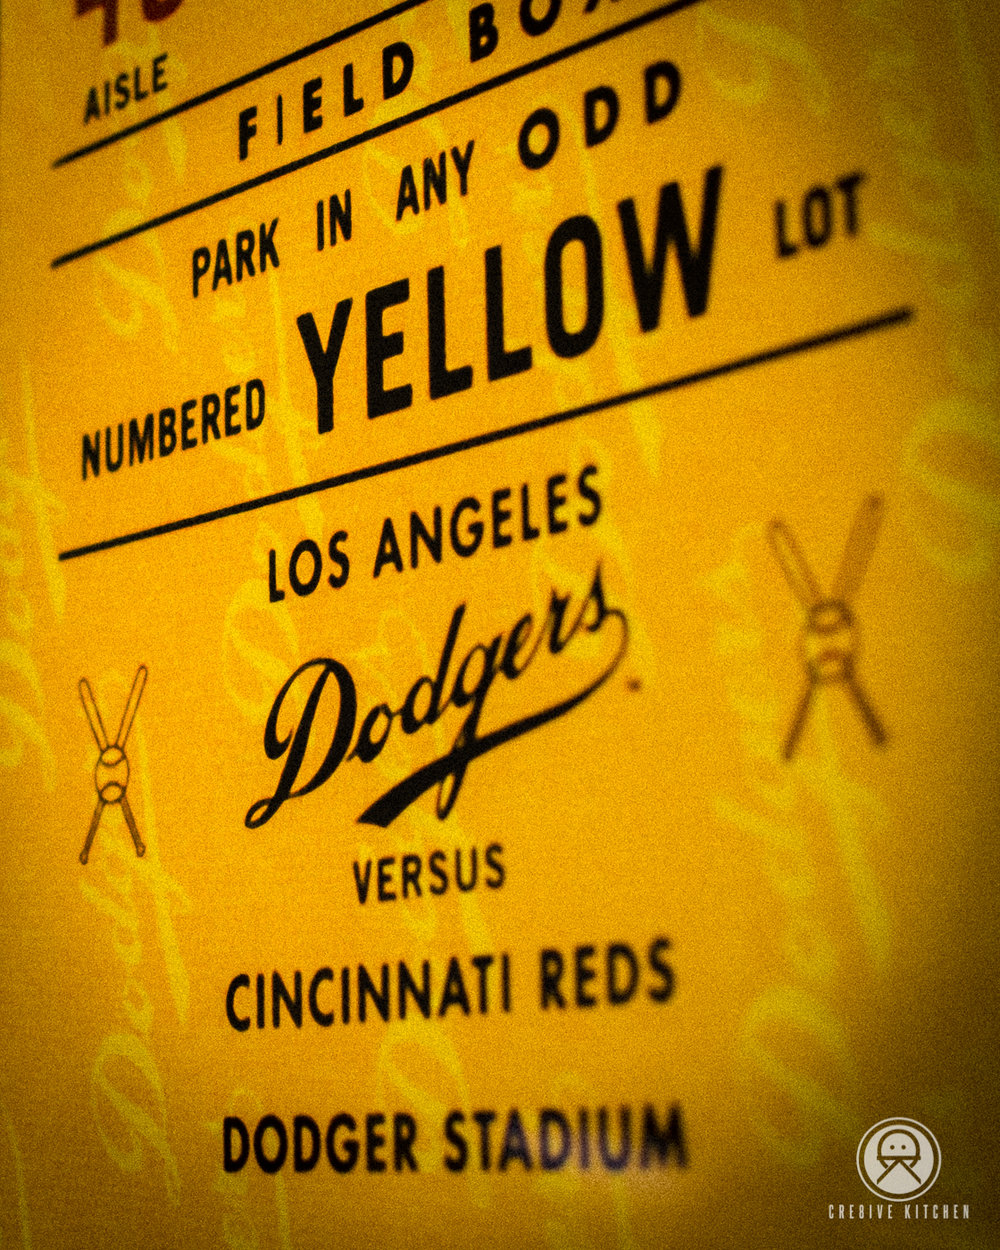 Dodgers-0754.jpg